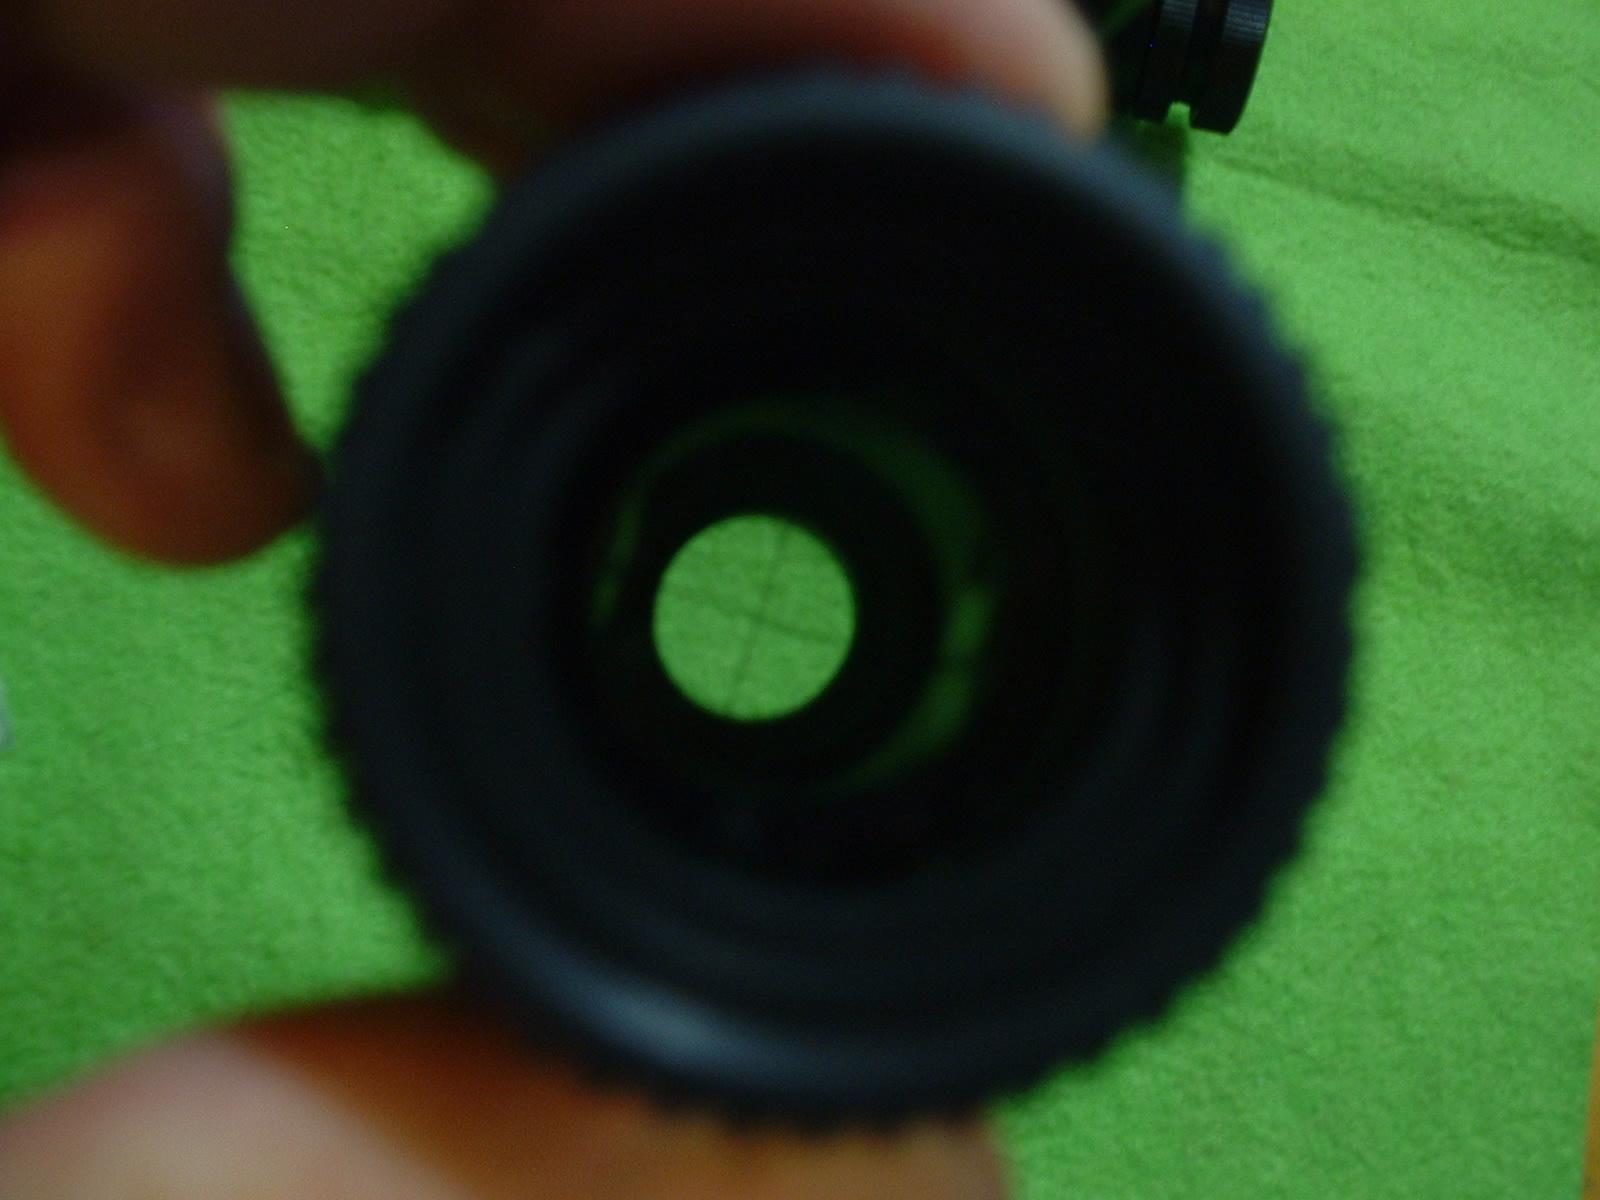 M16用 スコープを覗くDoburoku-TAO.JPG